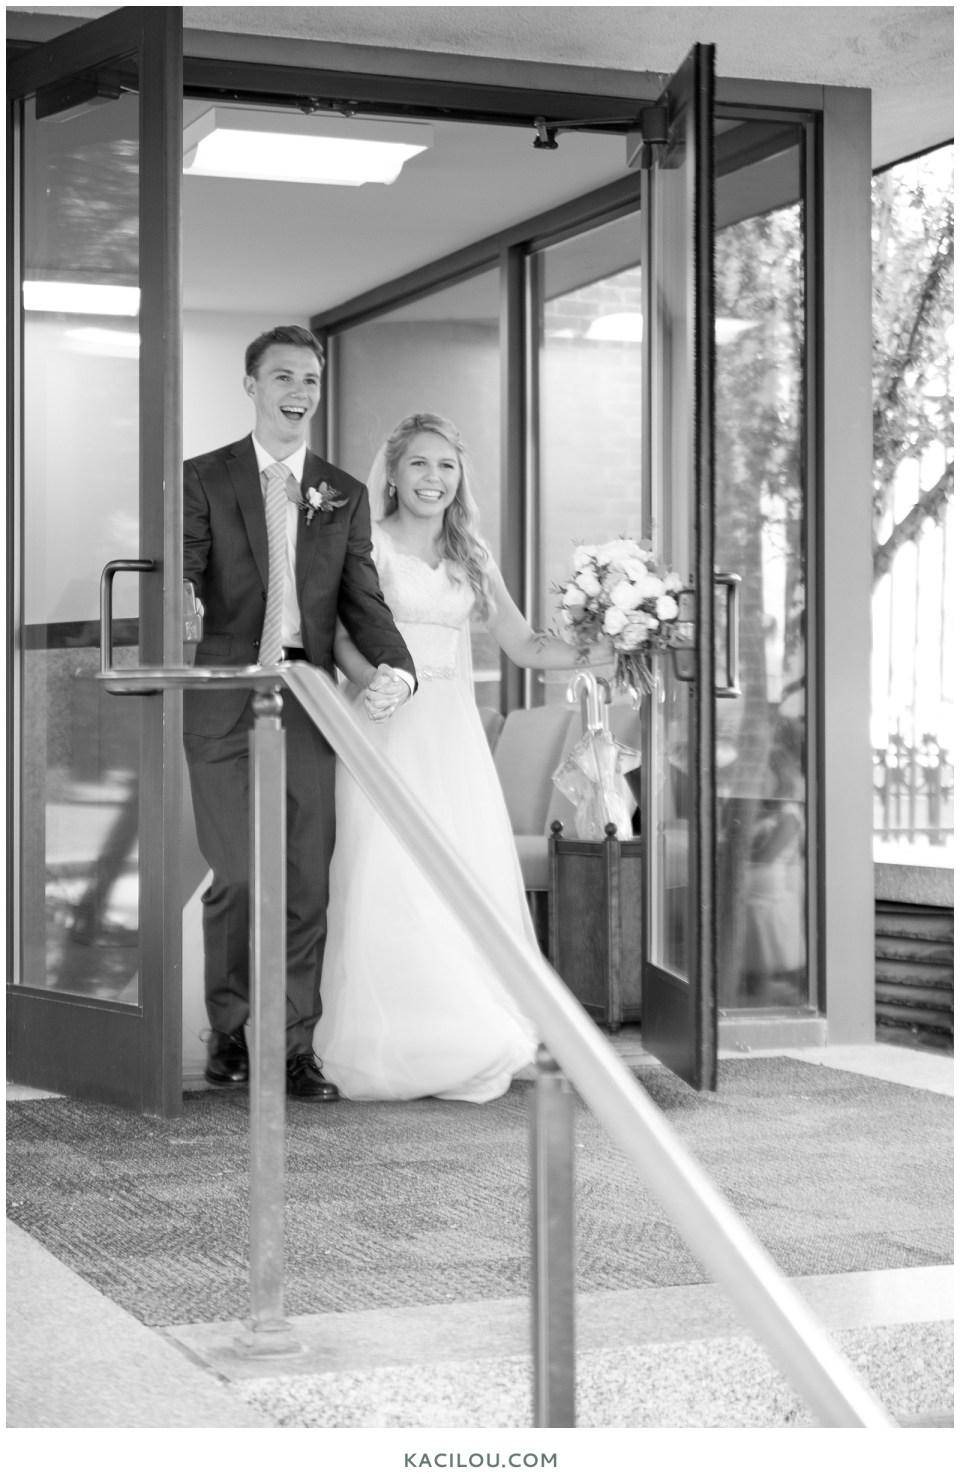 Salt Lake City Temple Wedding Photos by Kaci Lou Photography for Sam and Kennedy-7002.jpg